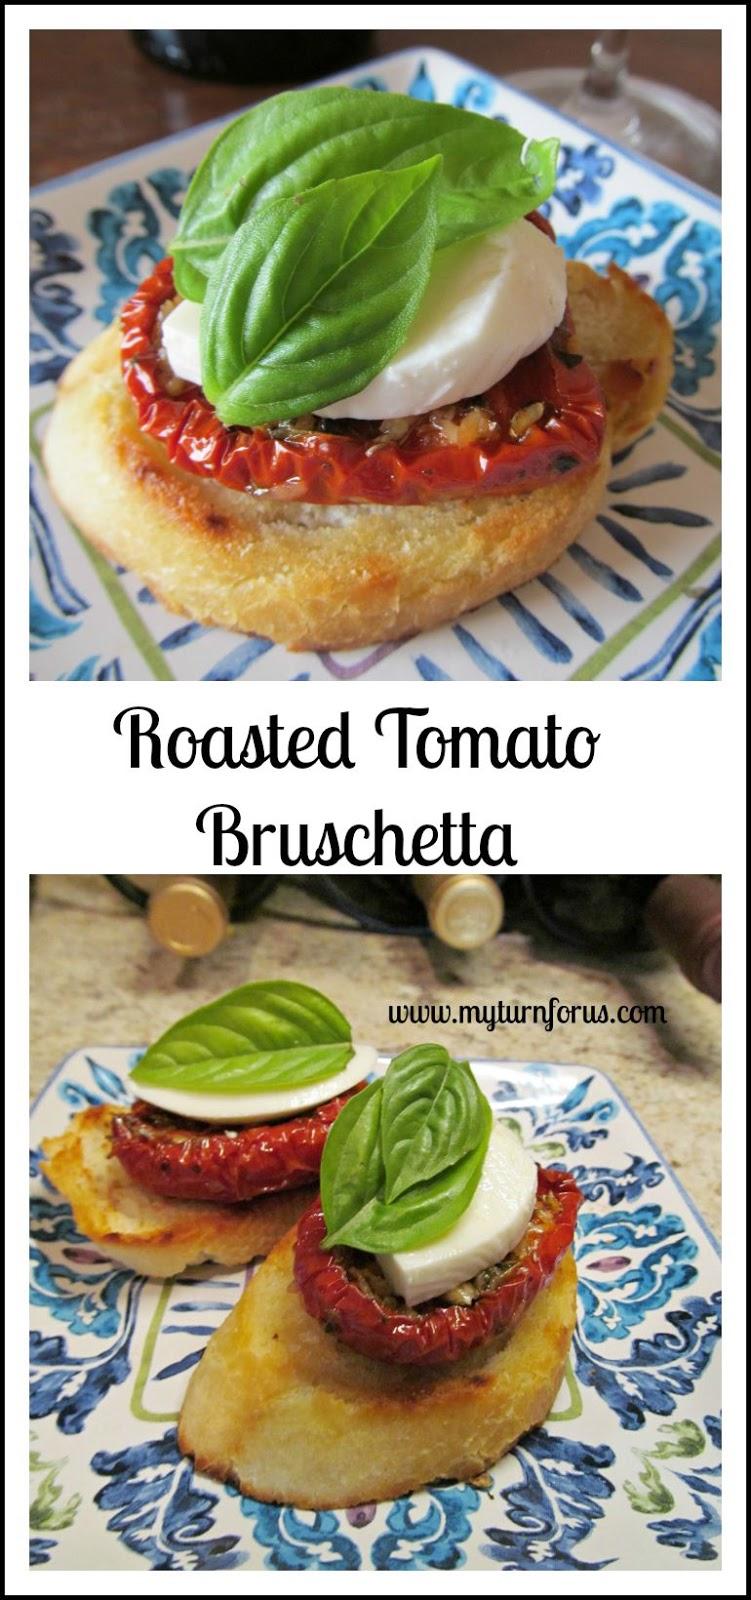 Roasted Tomato Brushetta